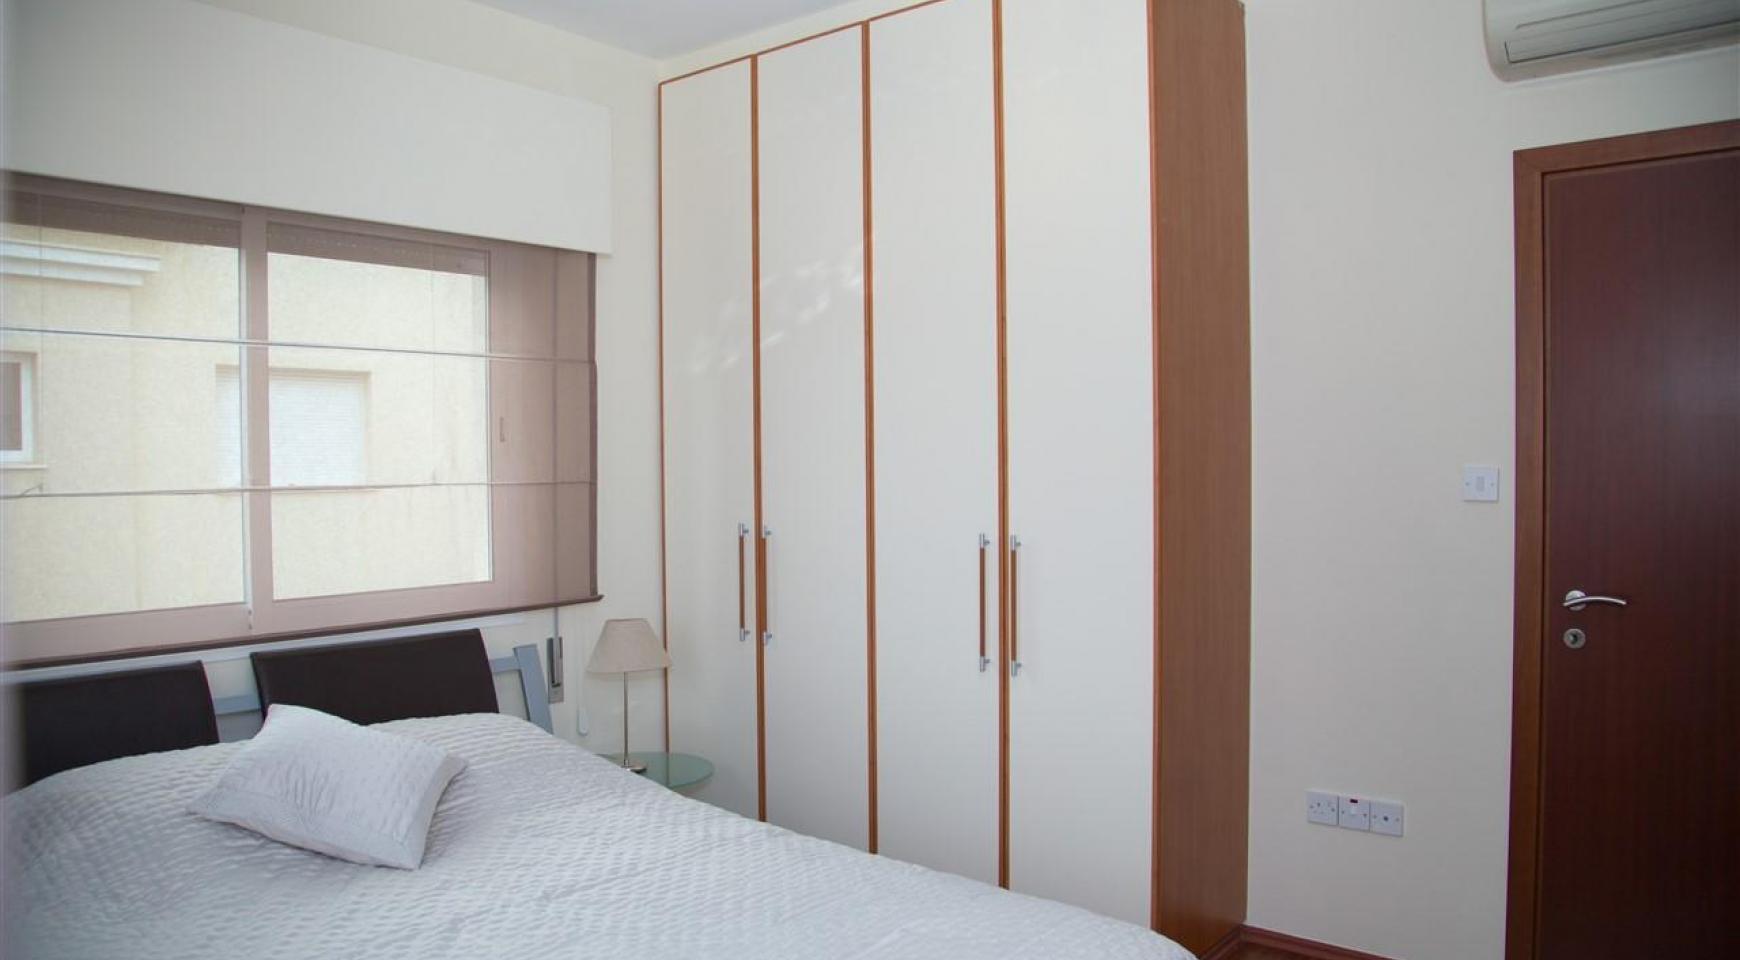 Luxury 2 Bedroom Apartment Mesogios Iris 304 in the Tourist area near the Beach - 16